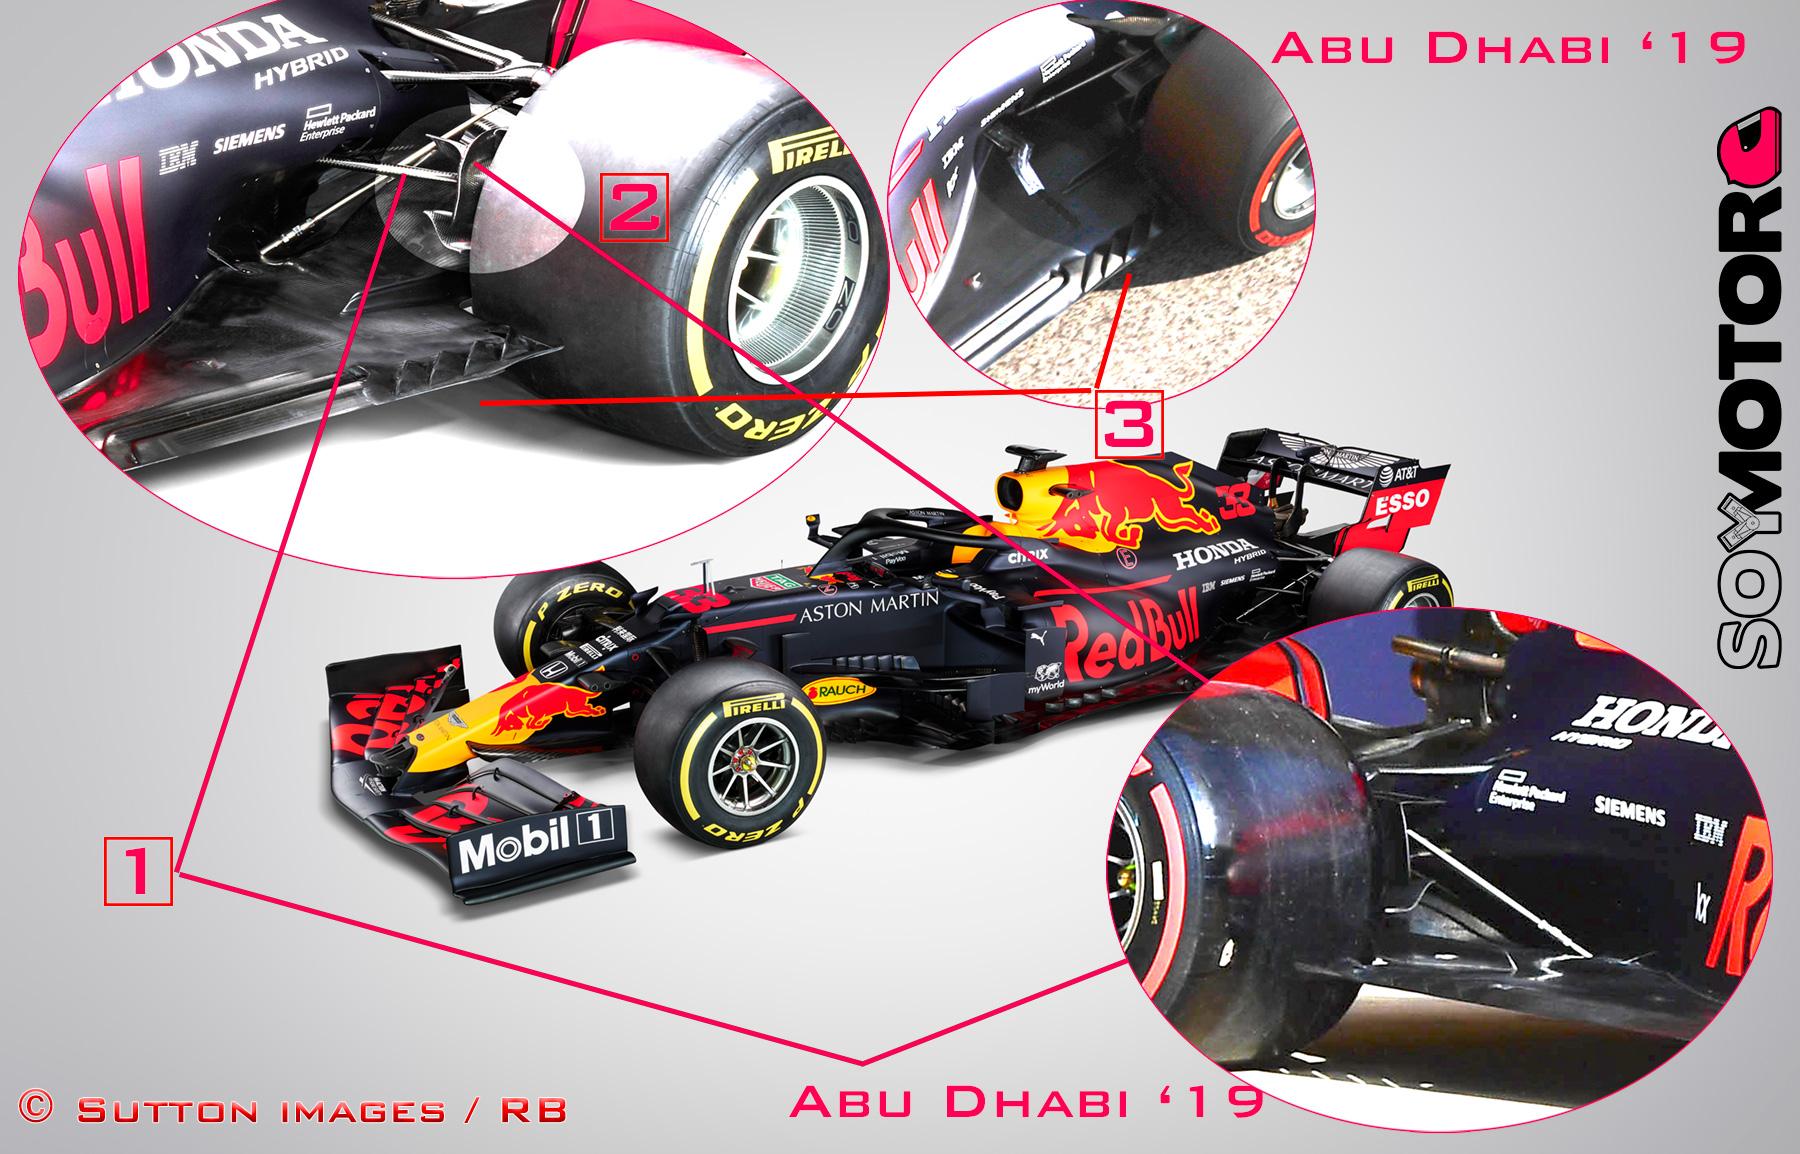 red-bull-suspension-trasera-suelo-paletas-traseras-soymotor.jpg